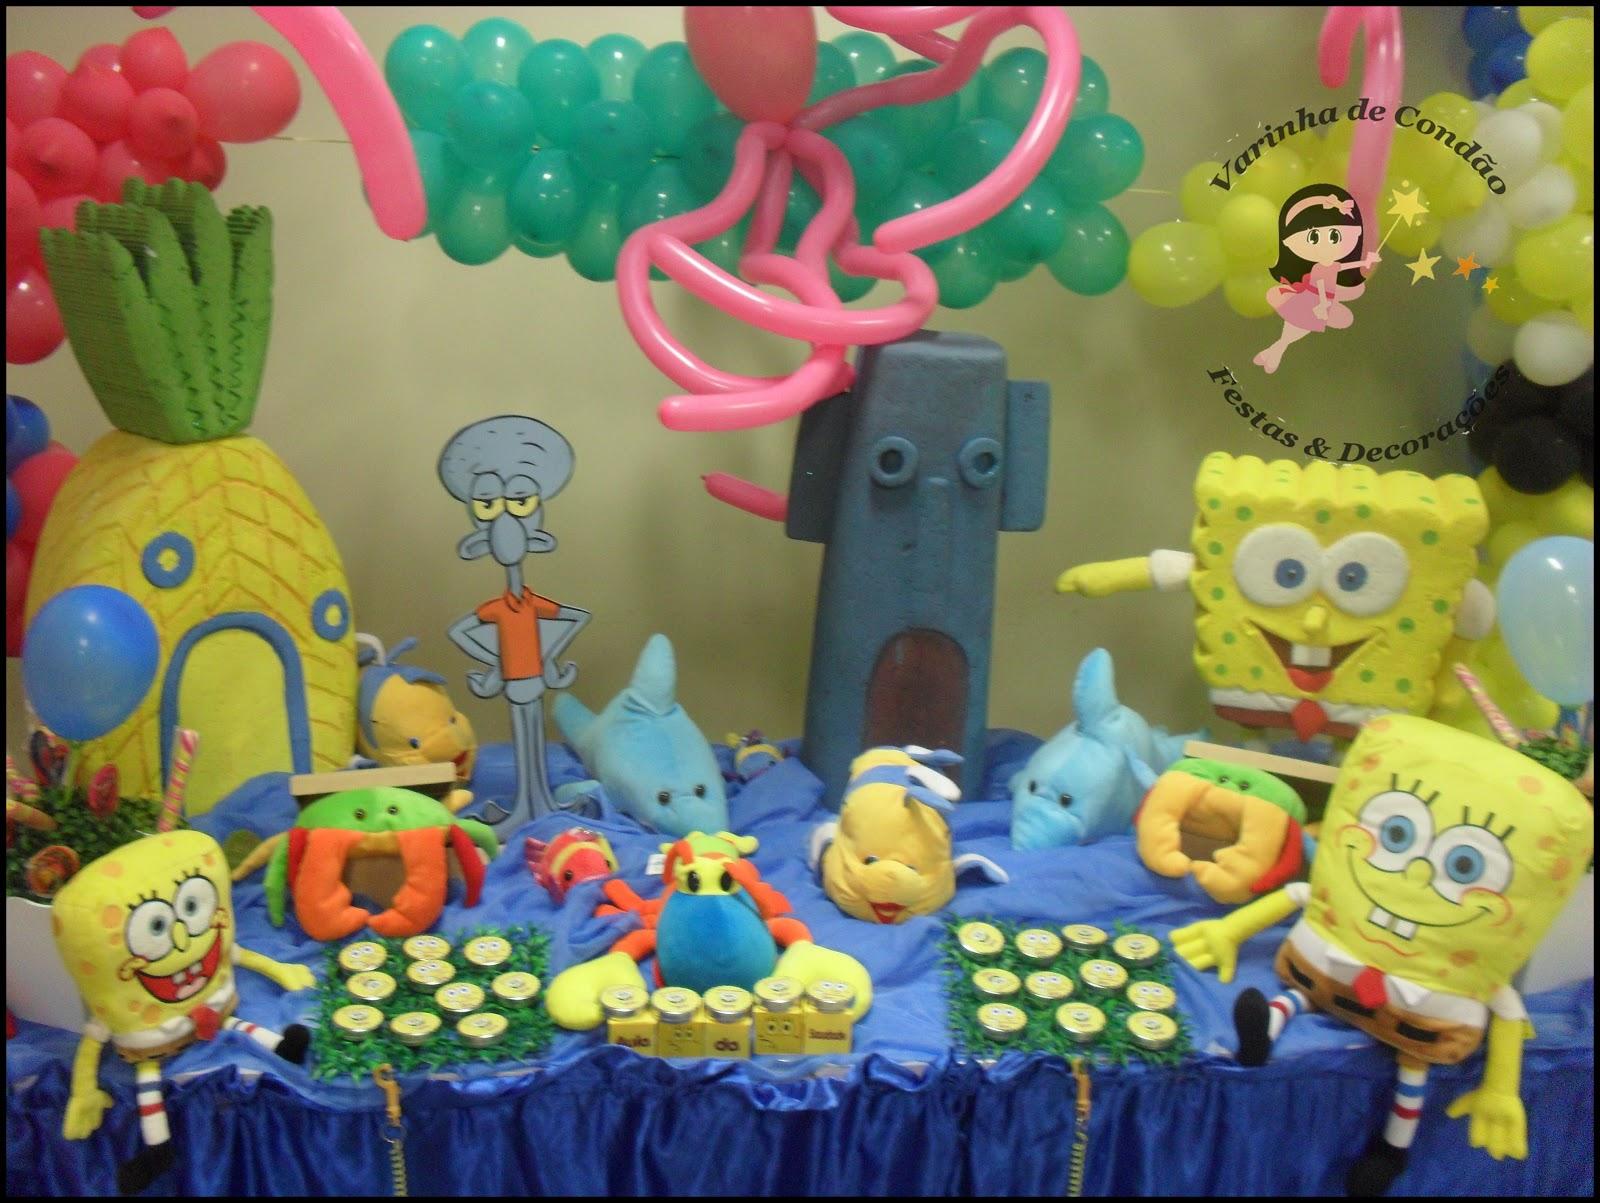 Delicias Caseiras Festas e Eventos - Sua empresa de festas